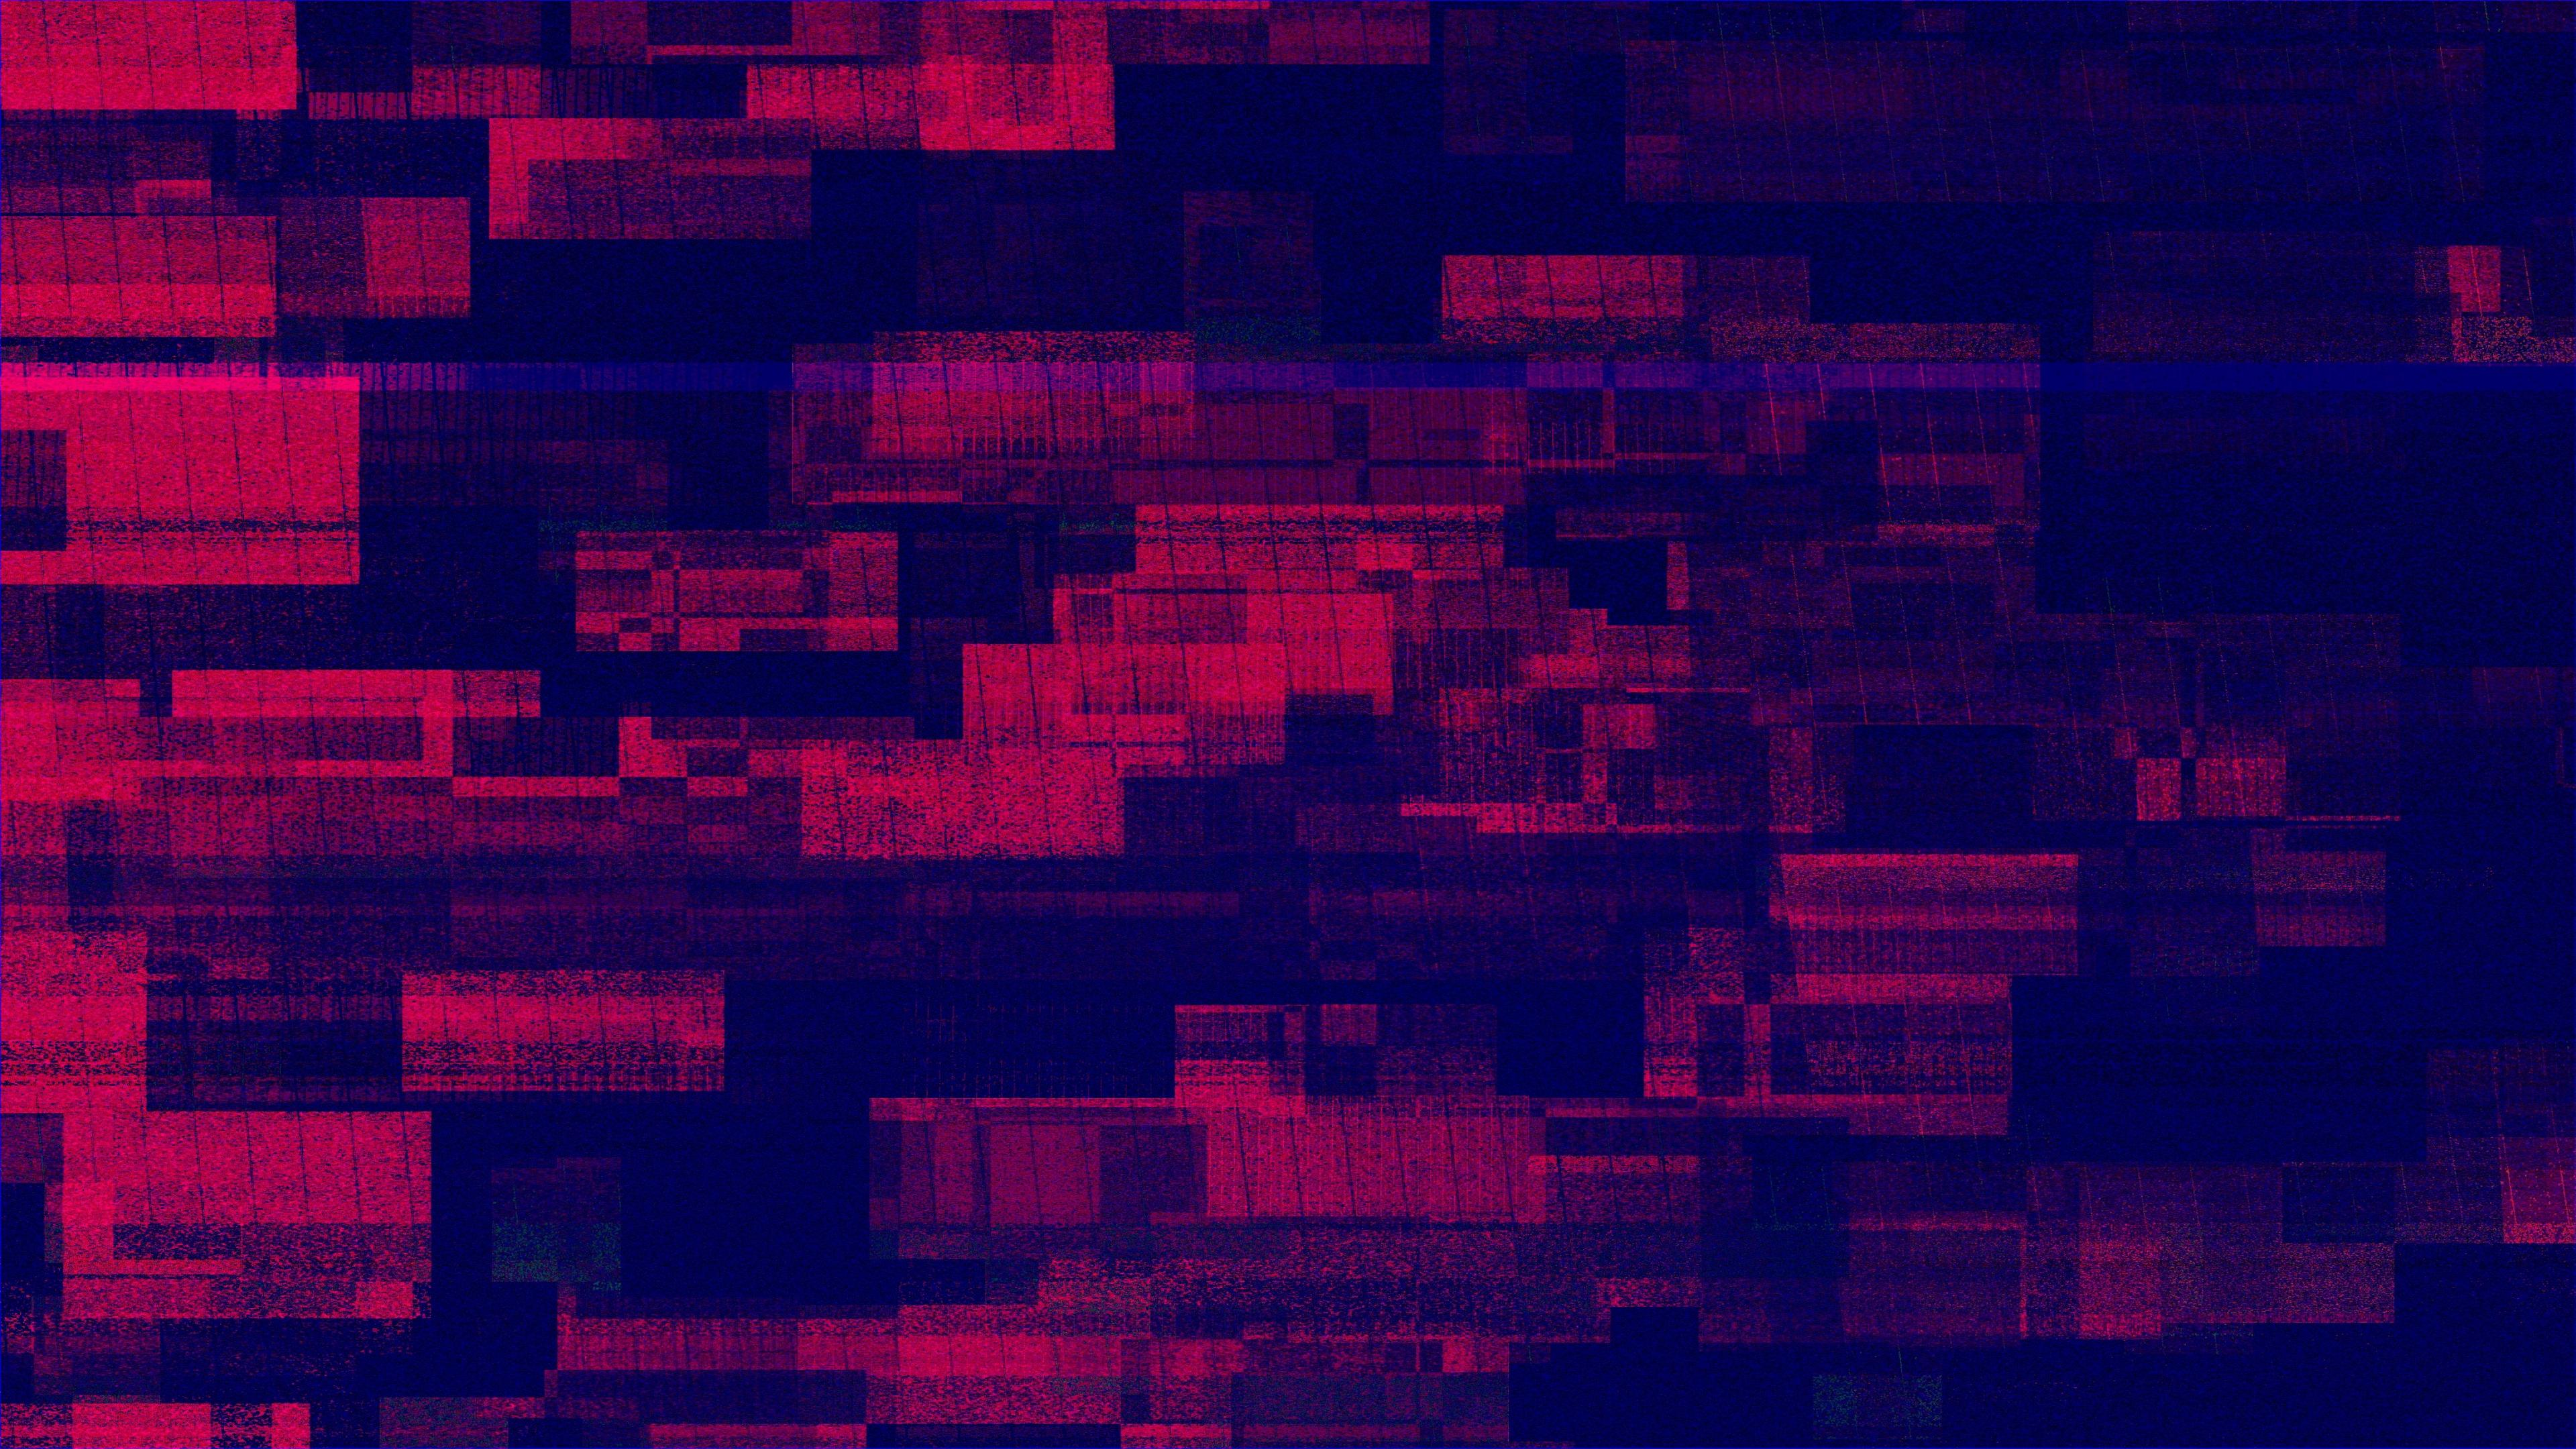 glitch art lines pixels defect 4k 1539369892 - glitch art, lines, pixels, defect 4k - Pixels, Lines, glitch art